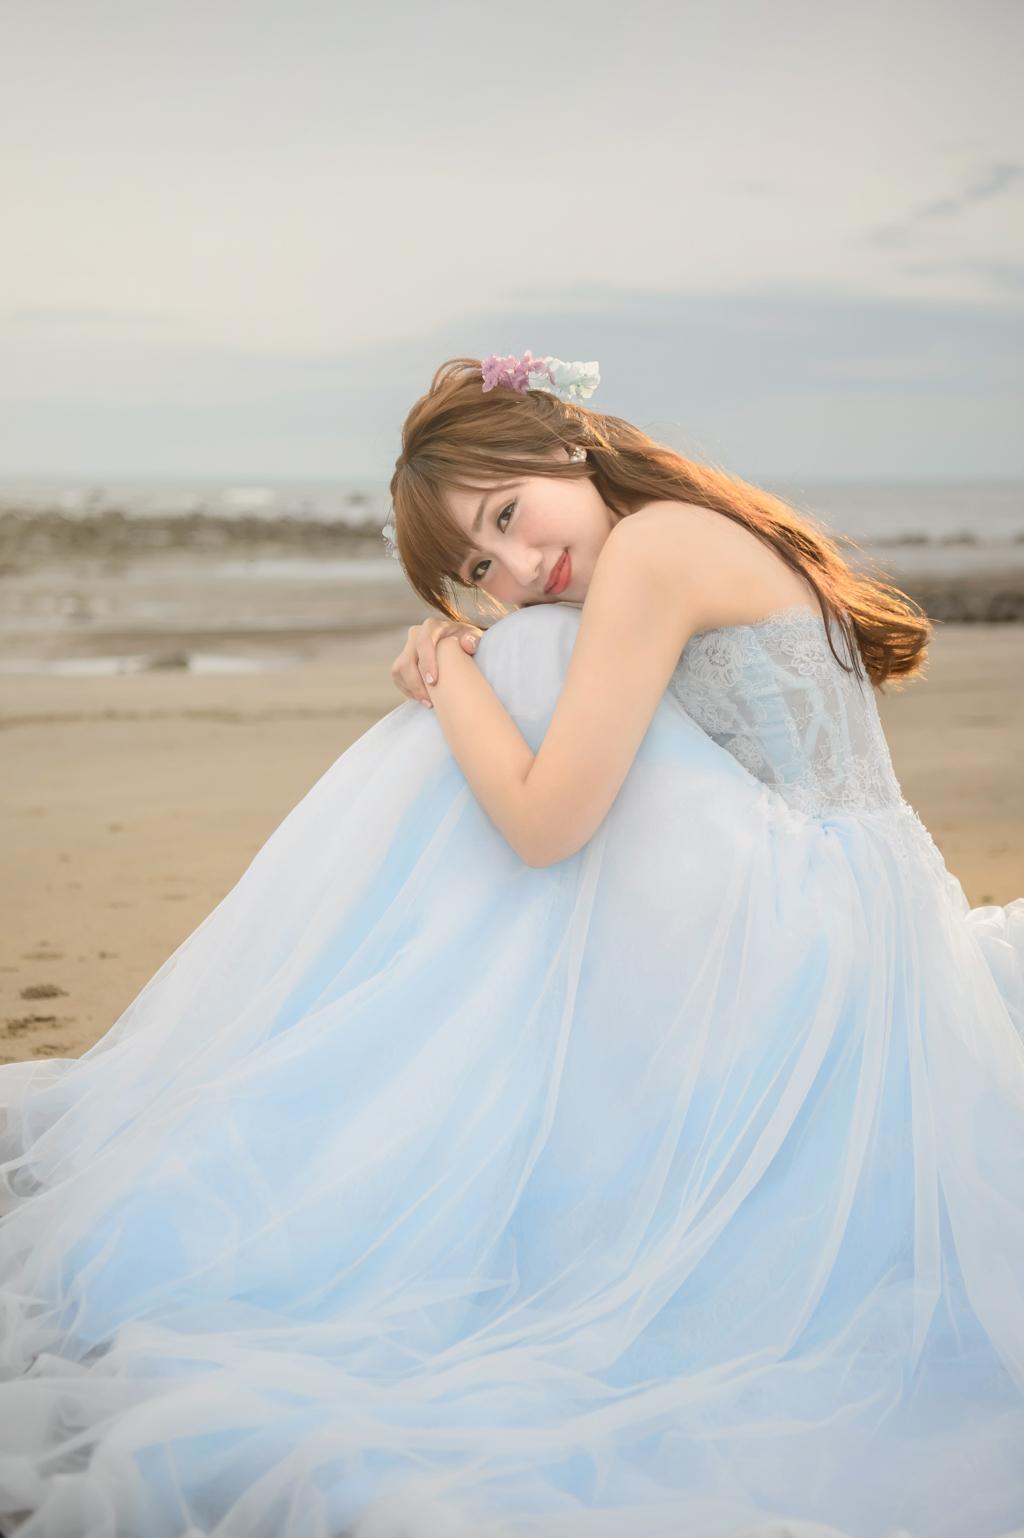 婚攝小勇, 小寶團隊, 自助婚紗, niniko, wedding day-014